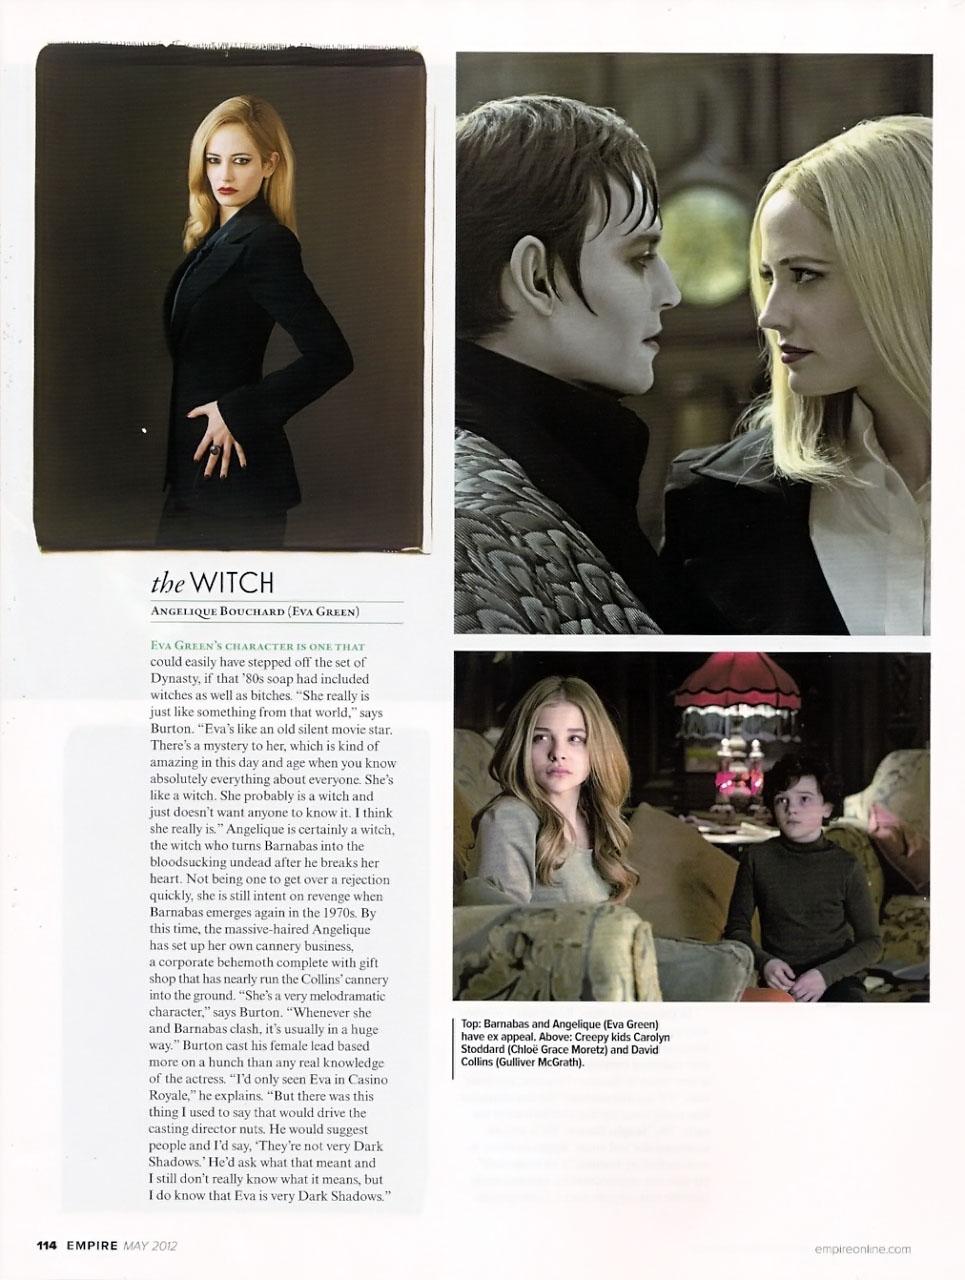 Empire Magazine May 2012 Scans ~ Dark Shadows Article